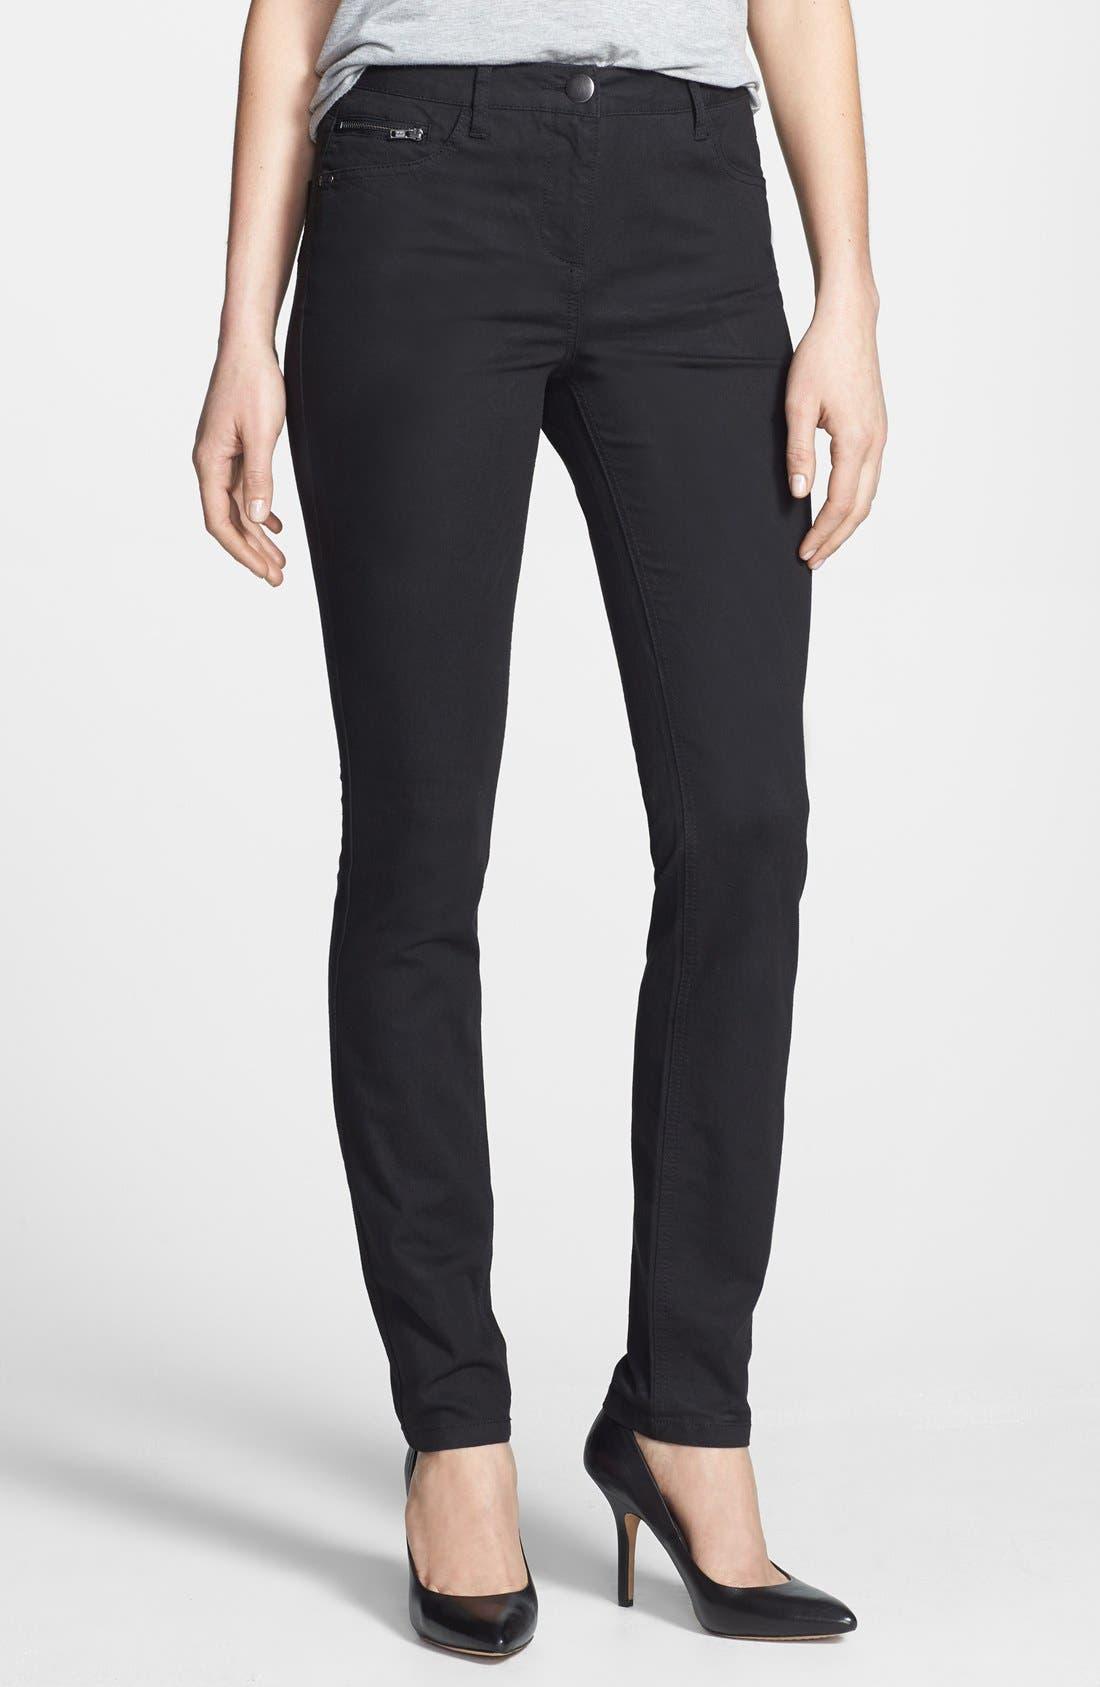 Main Image - Wallis Stretch Skinny Jeans (Black)